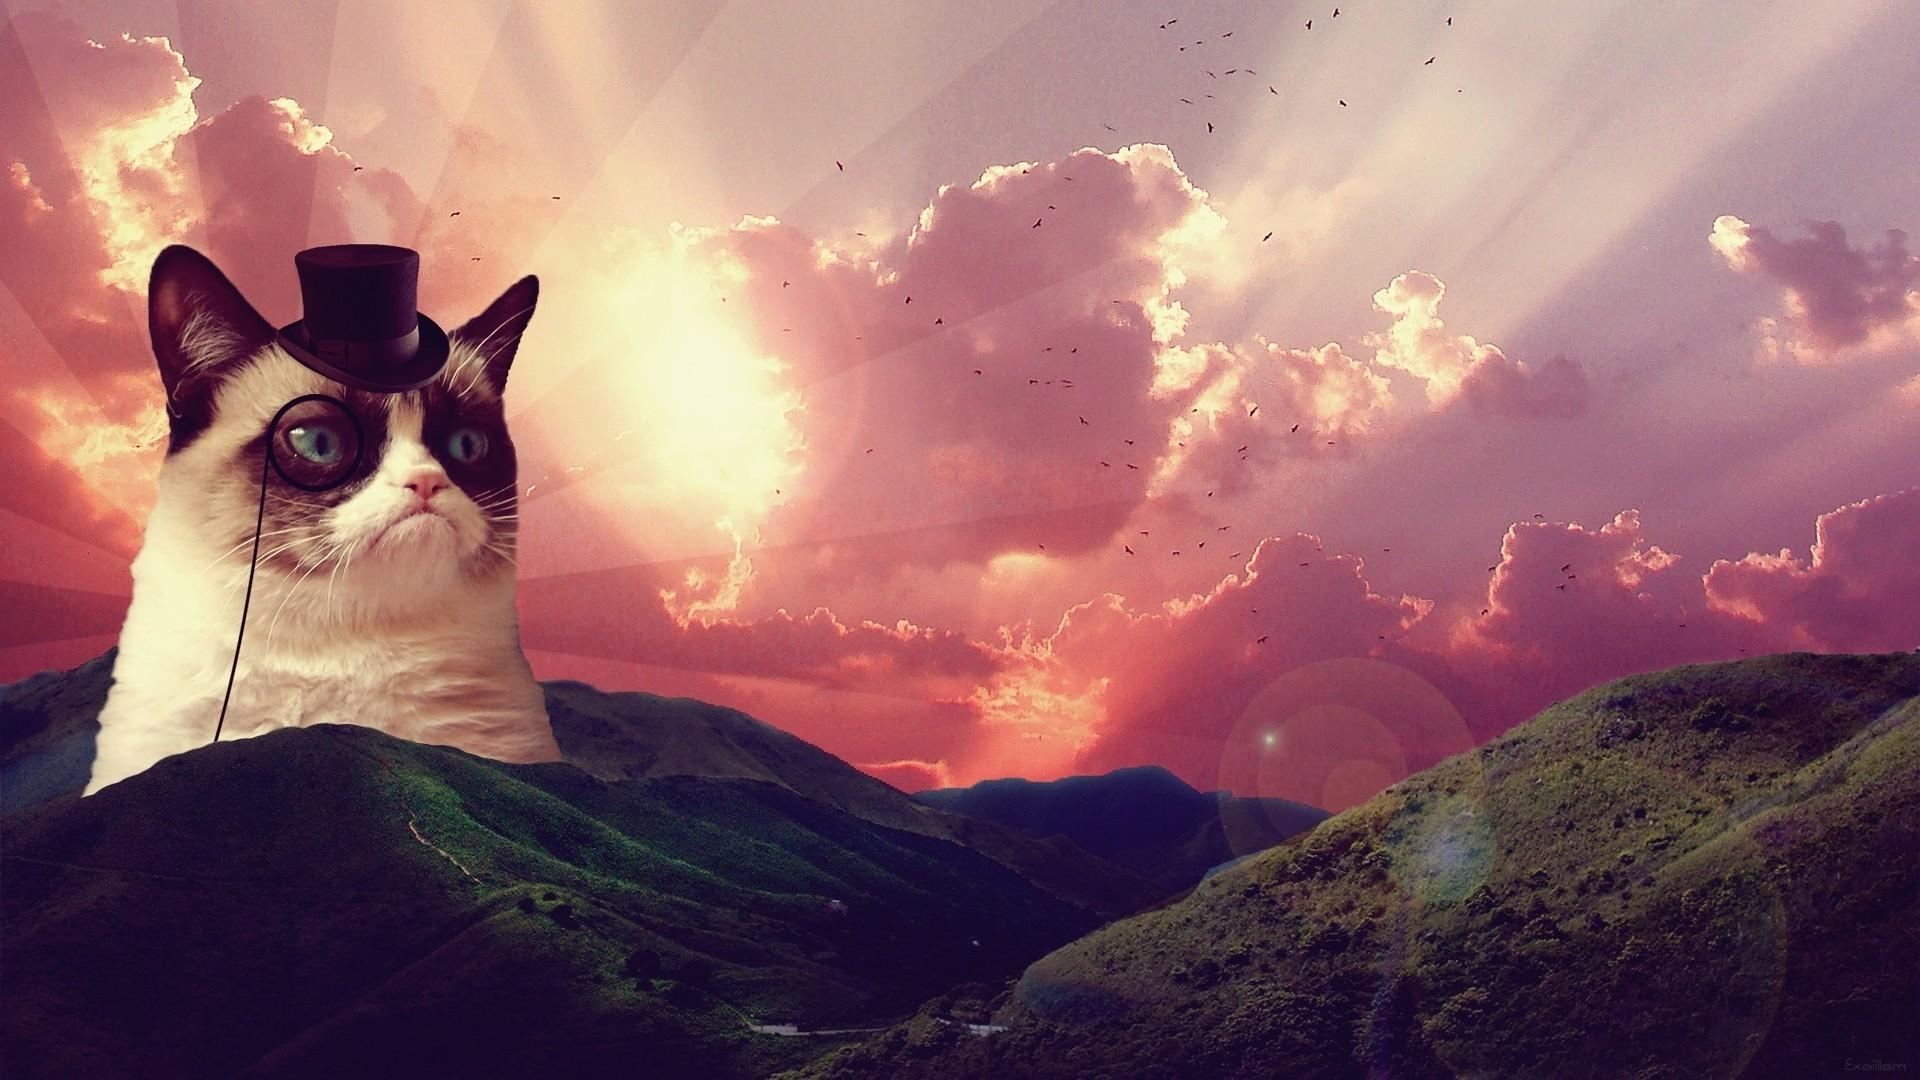 Res: 1920x1080, ... Grumpy Cat Full HD Quality Wallpapers ...